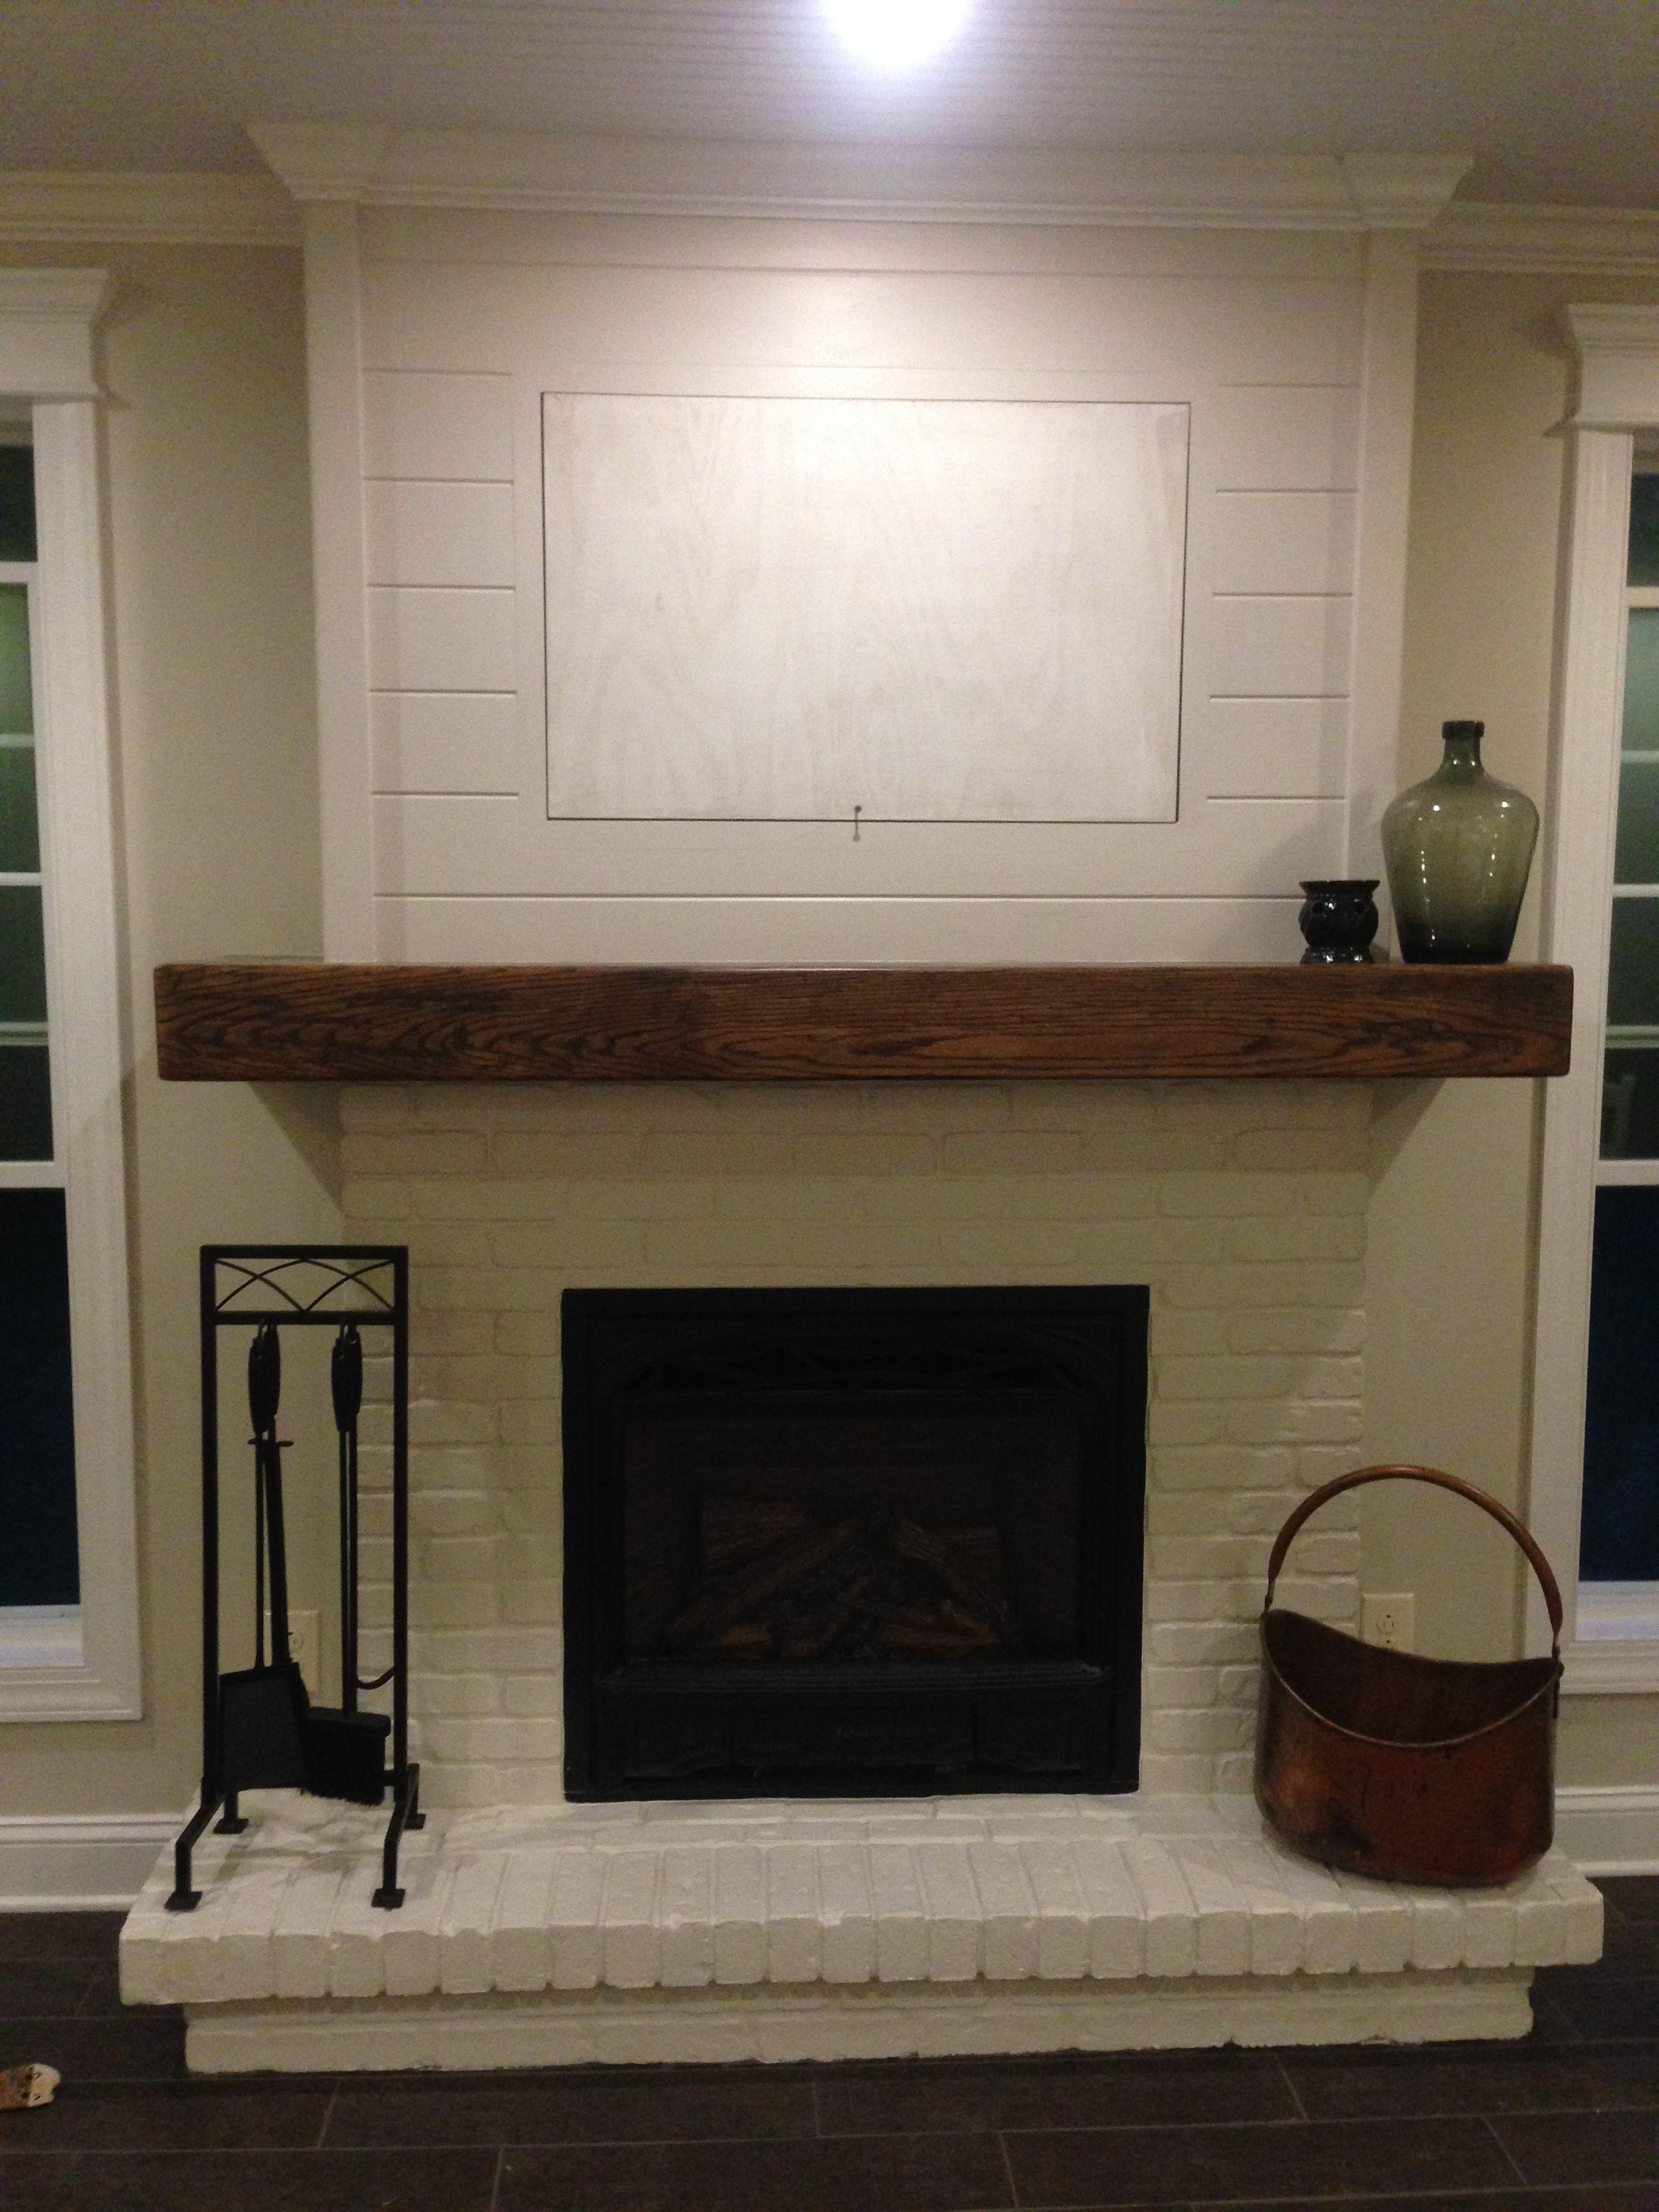 Painted brick wood mantel and shiplap minus the hidatv